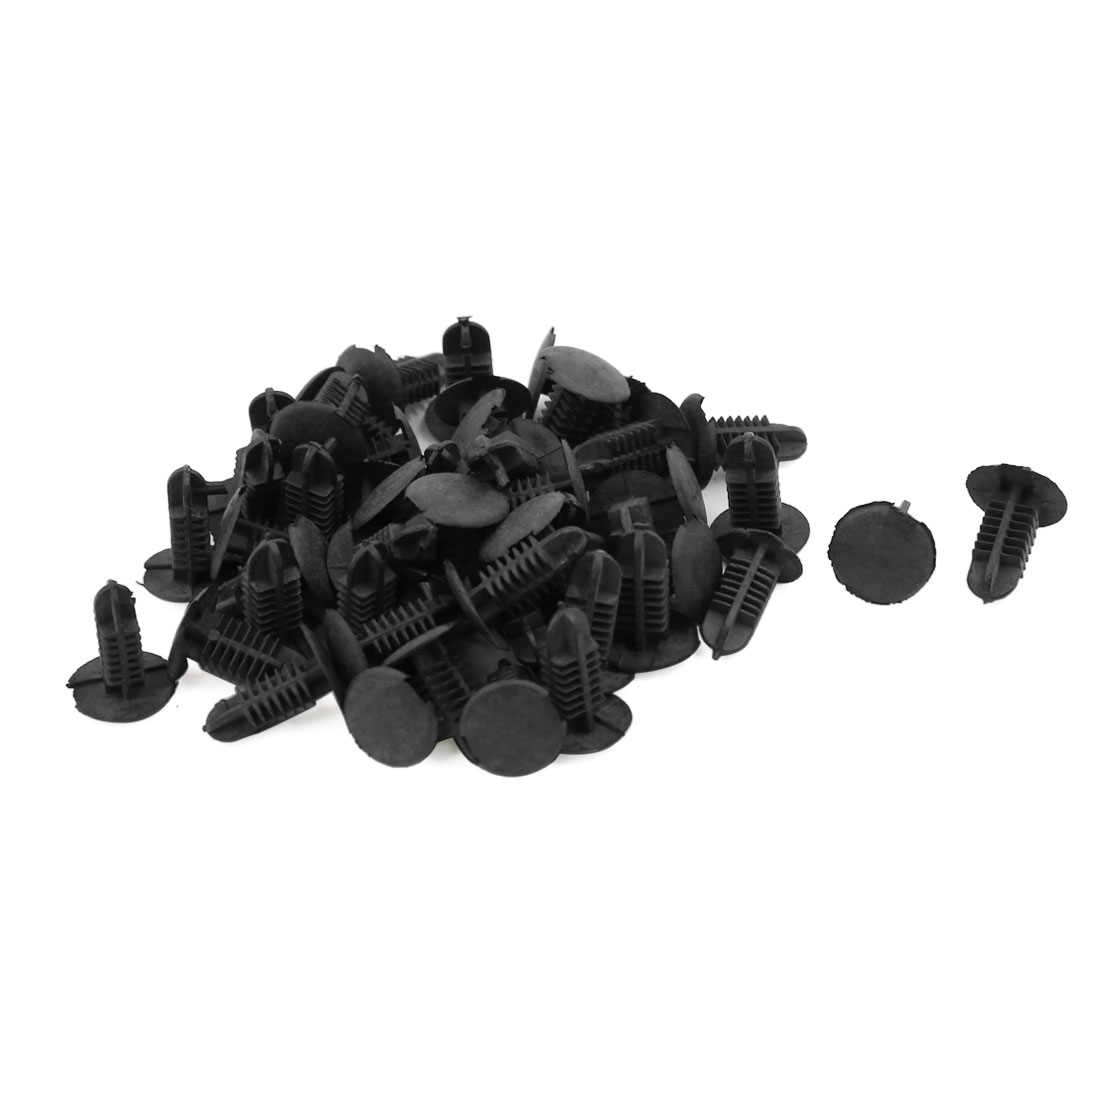 50 Pcs Black Plastic Splash Guard Moulding Bumper Clips 6mm x 5mm